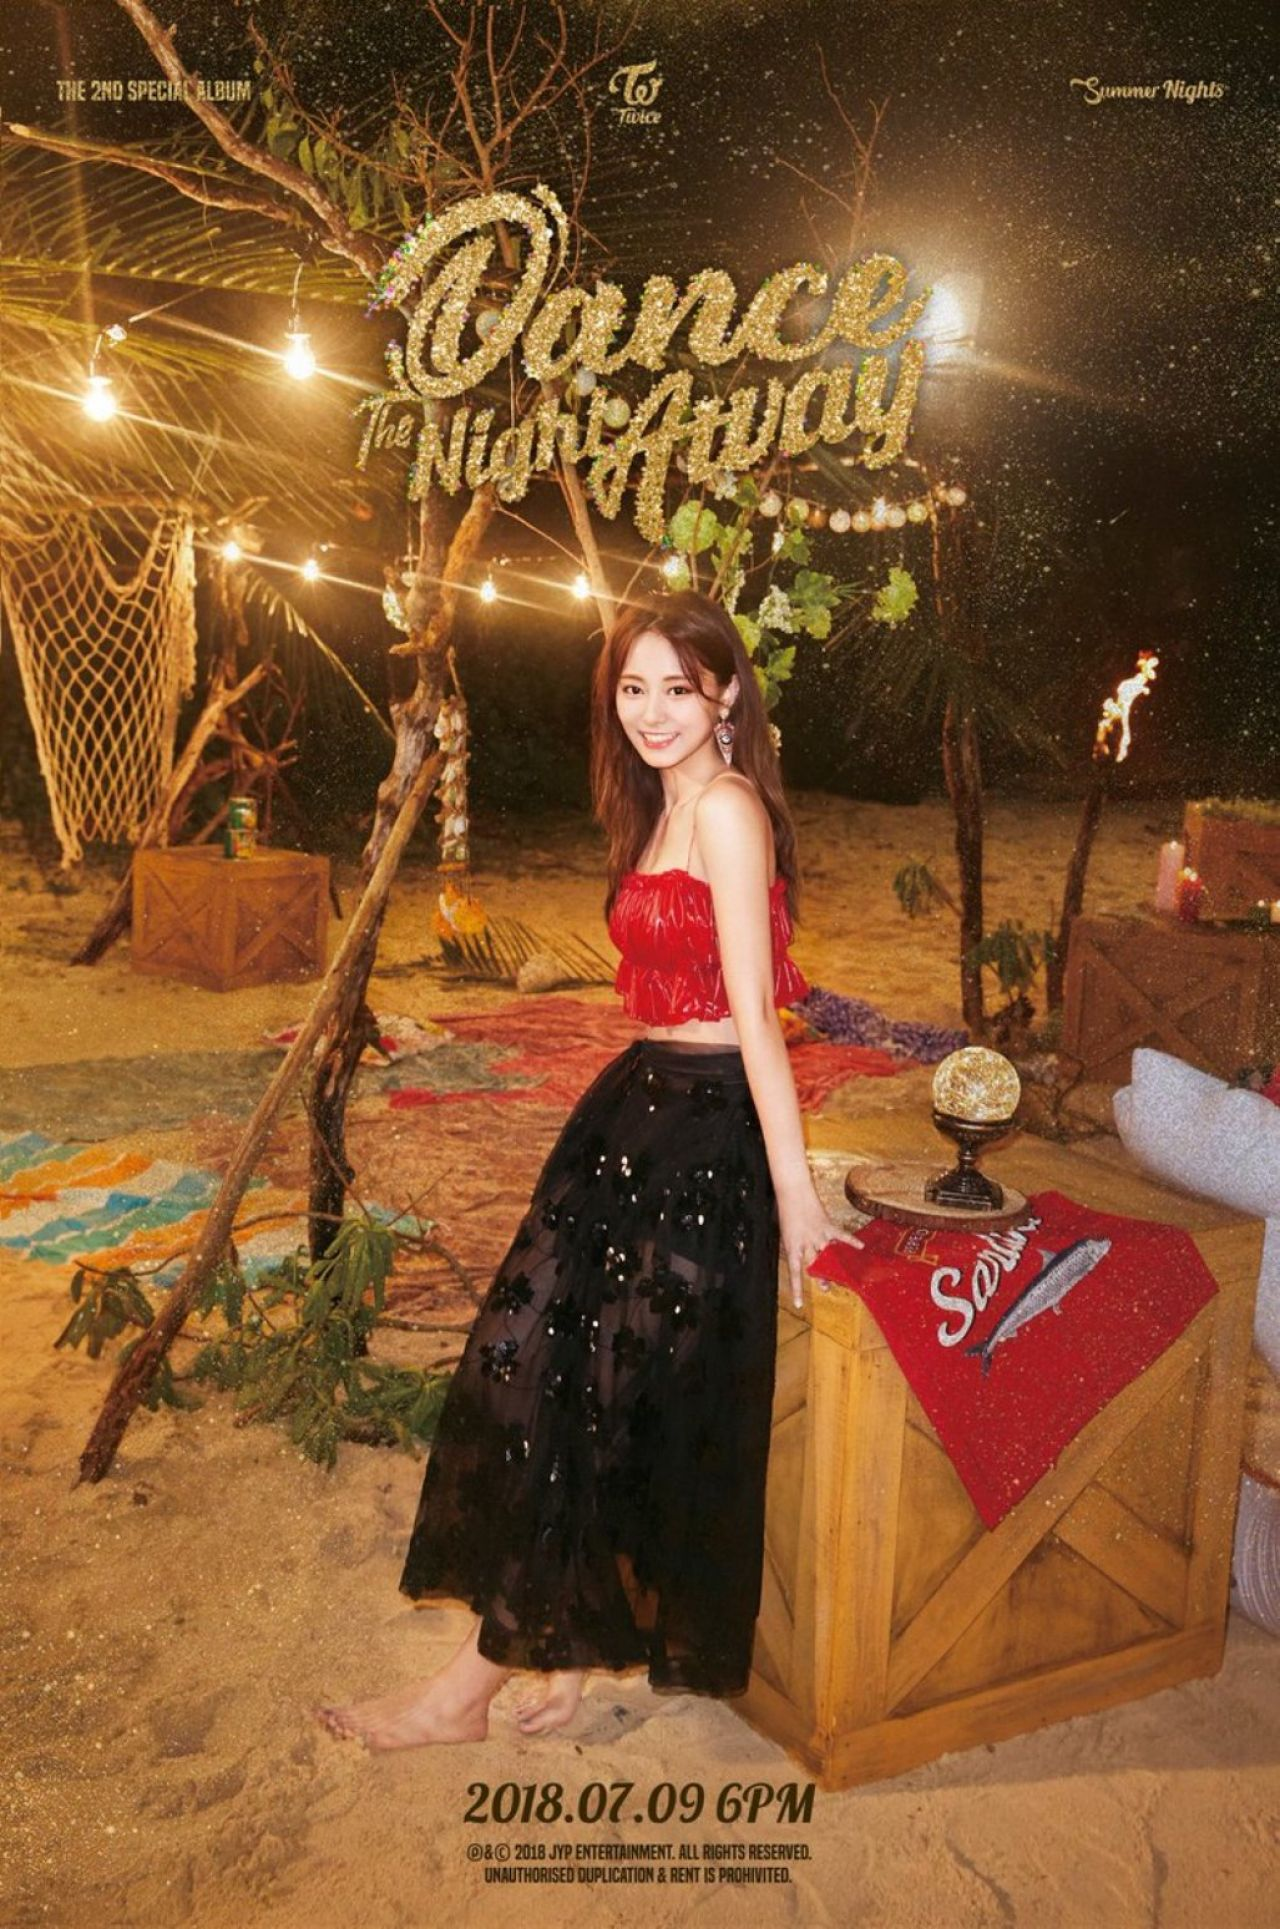 Twice  Summer Nights 2nd Special Album Teaser Photos 2018